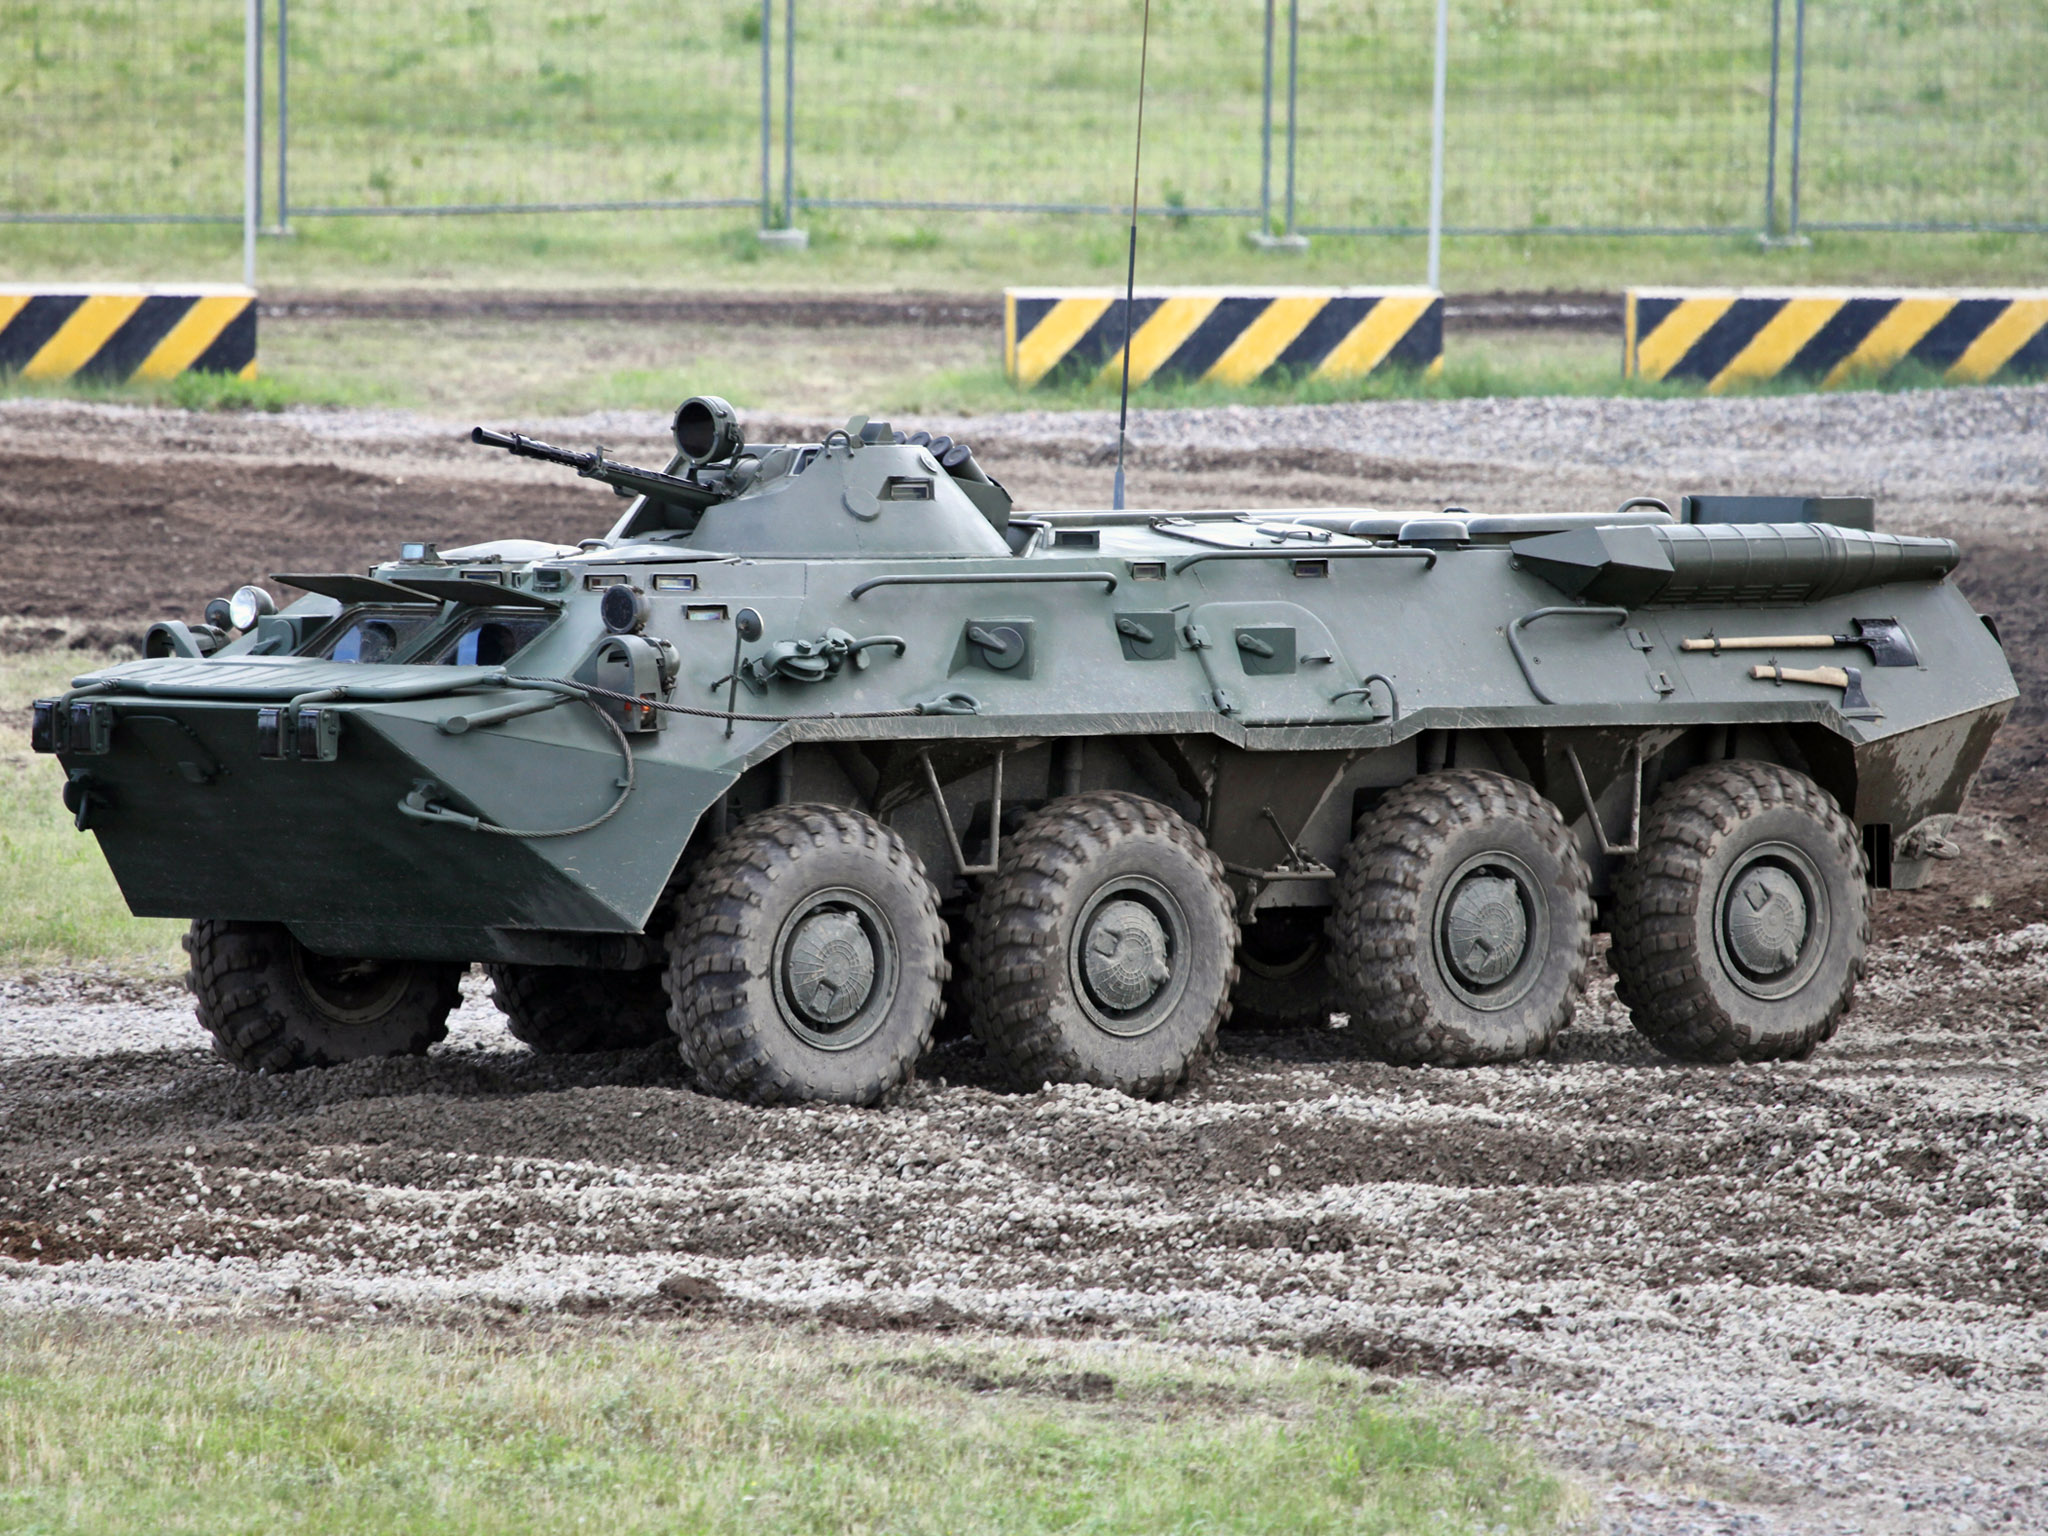 1984 GAZ 5903 BTR 80 military 8-0 8x8 s wallpaper | 2048x1536